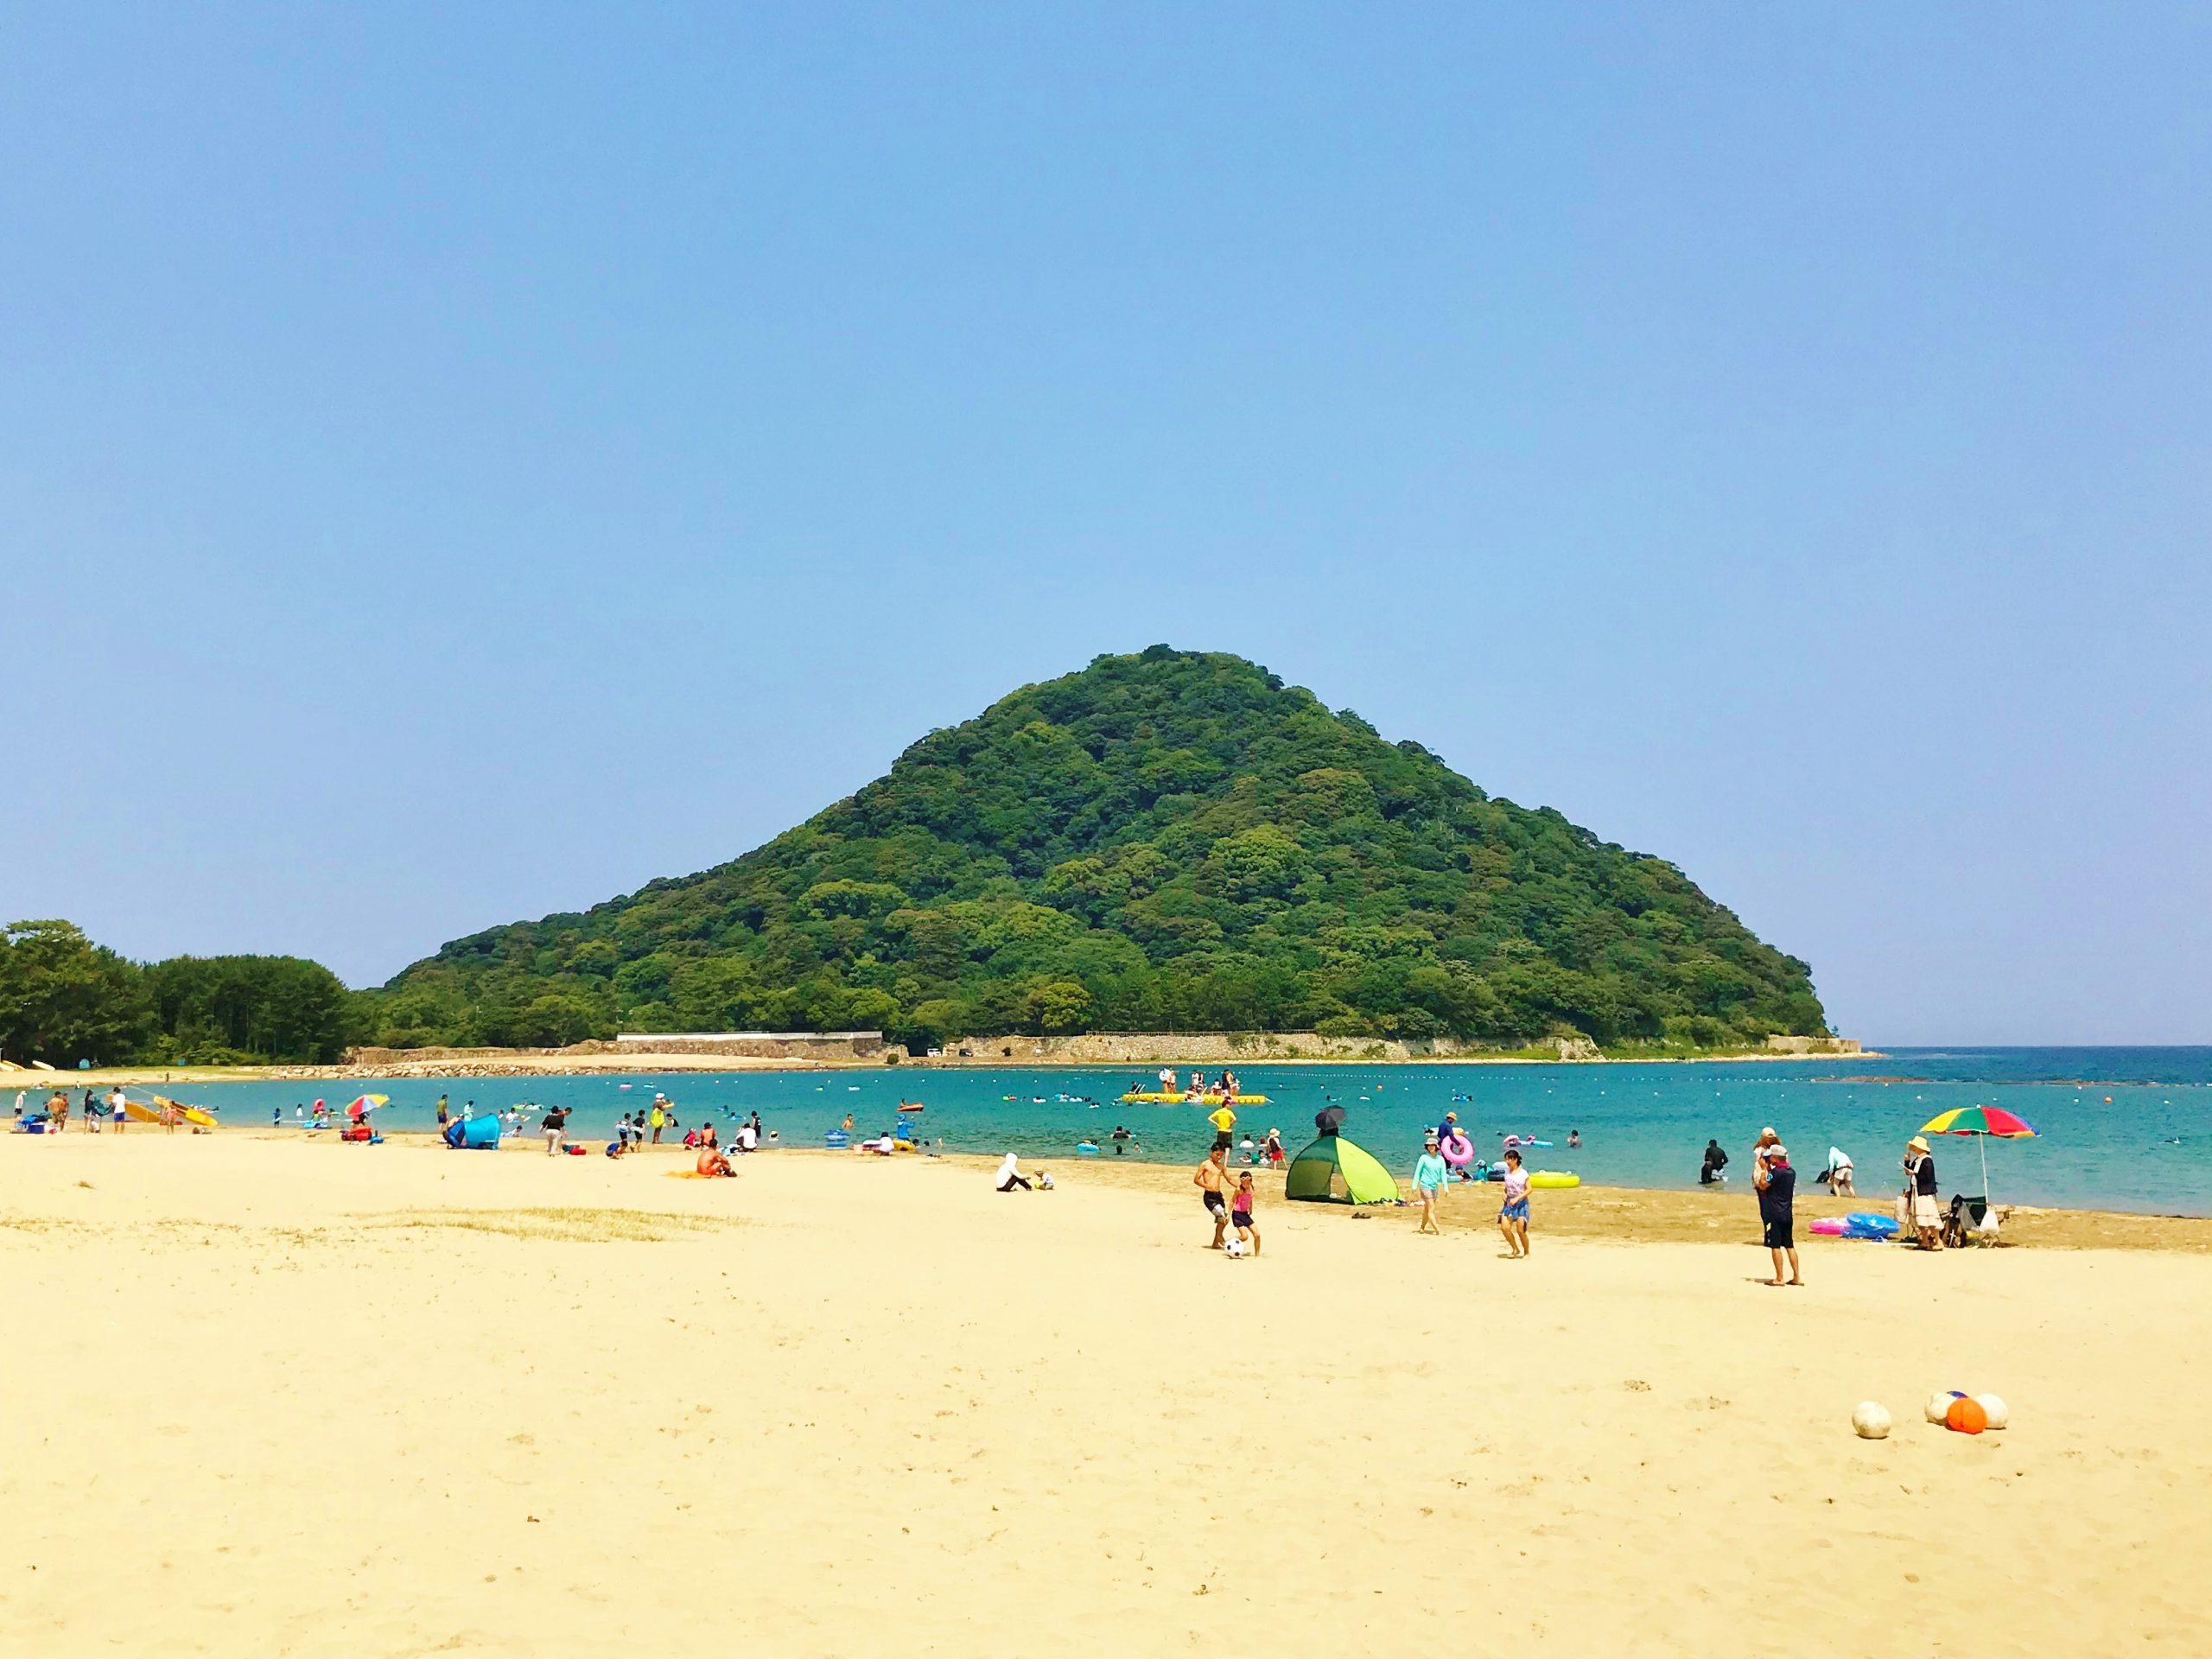 画像:菊ヶ浜海水浴場 海開き